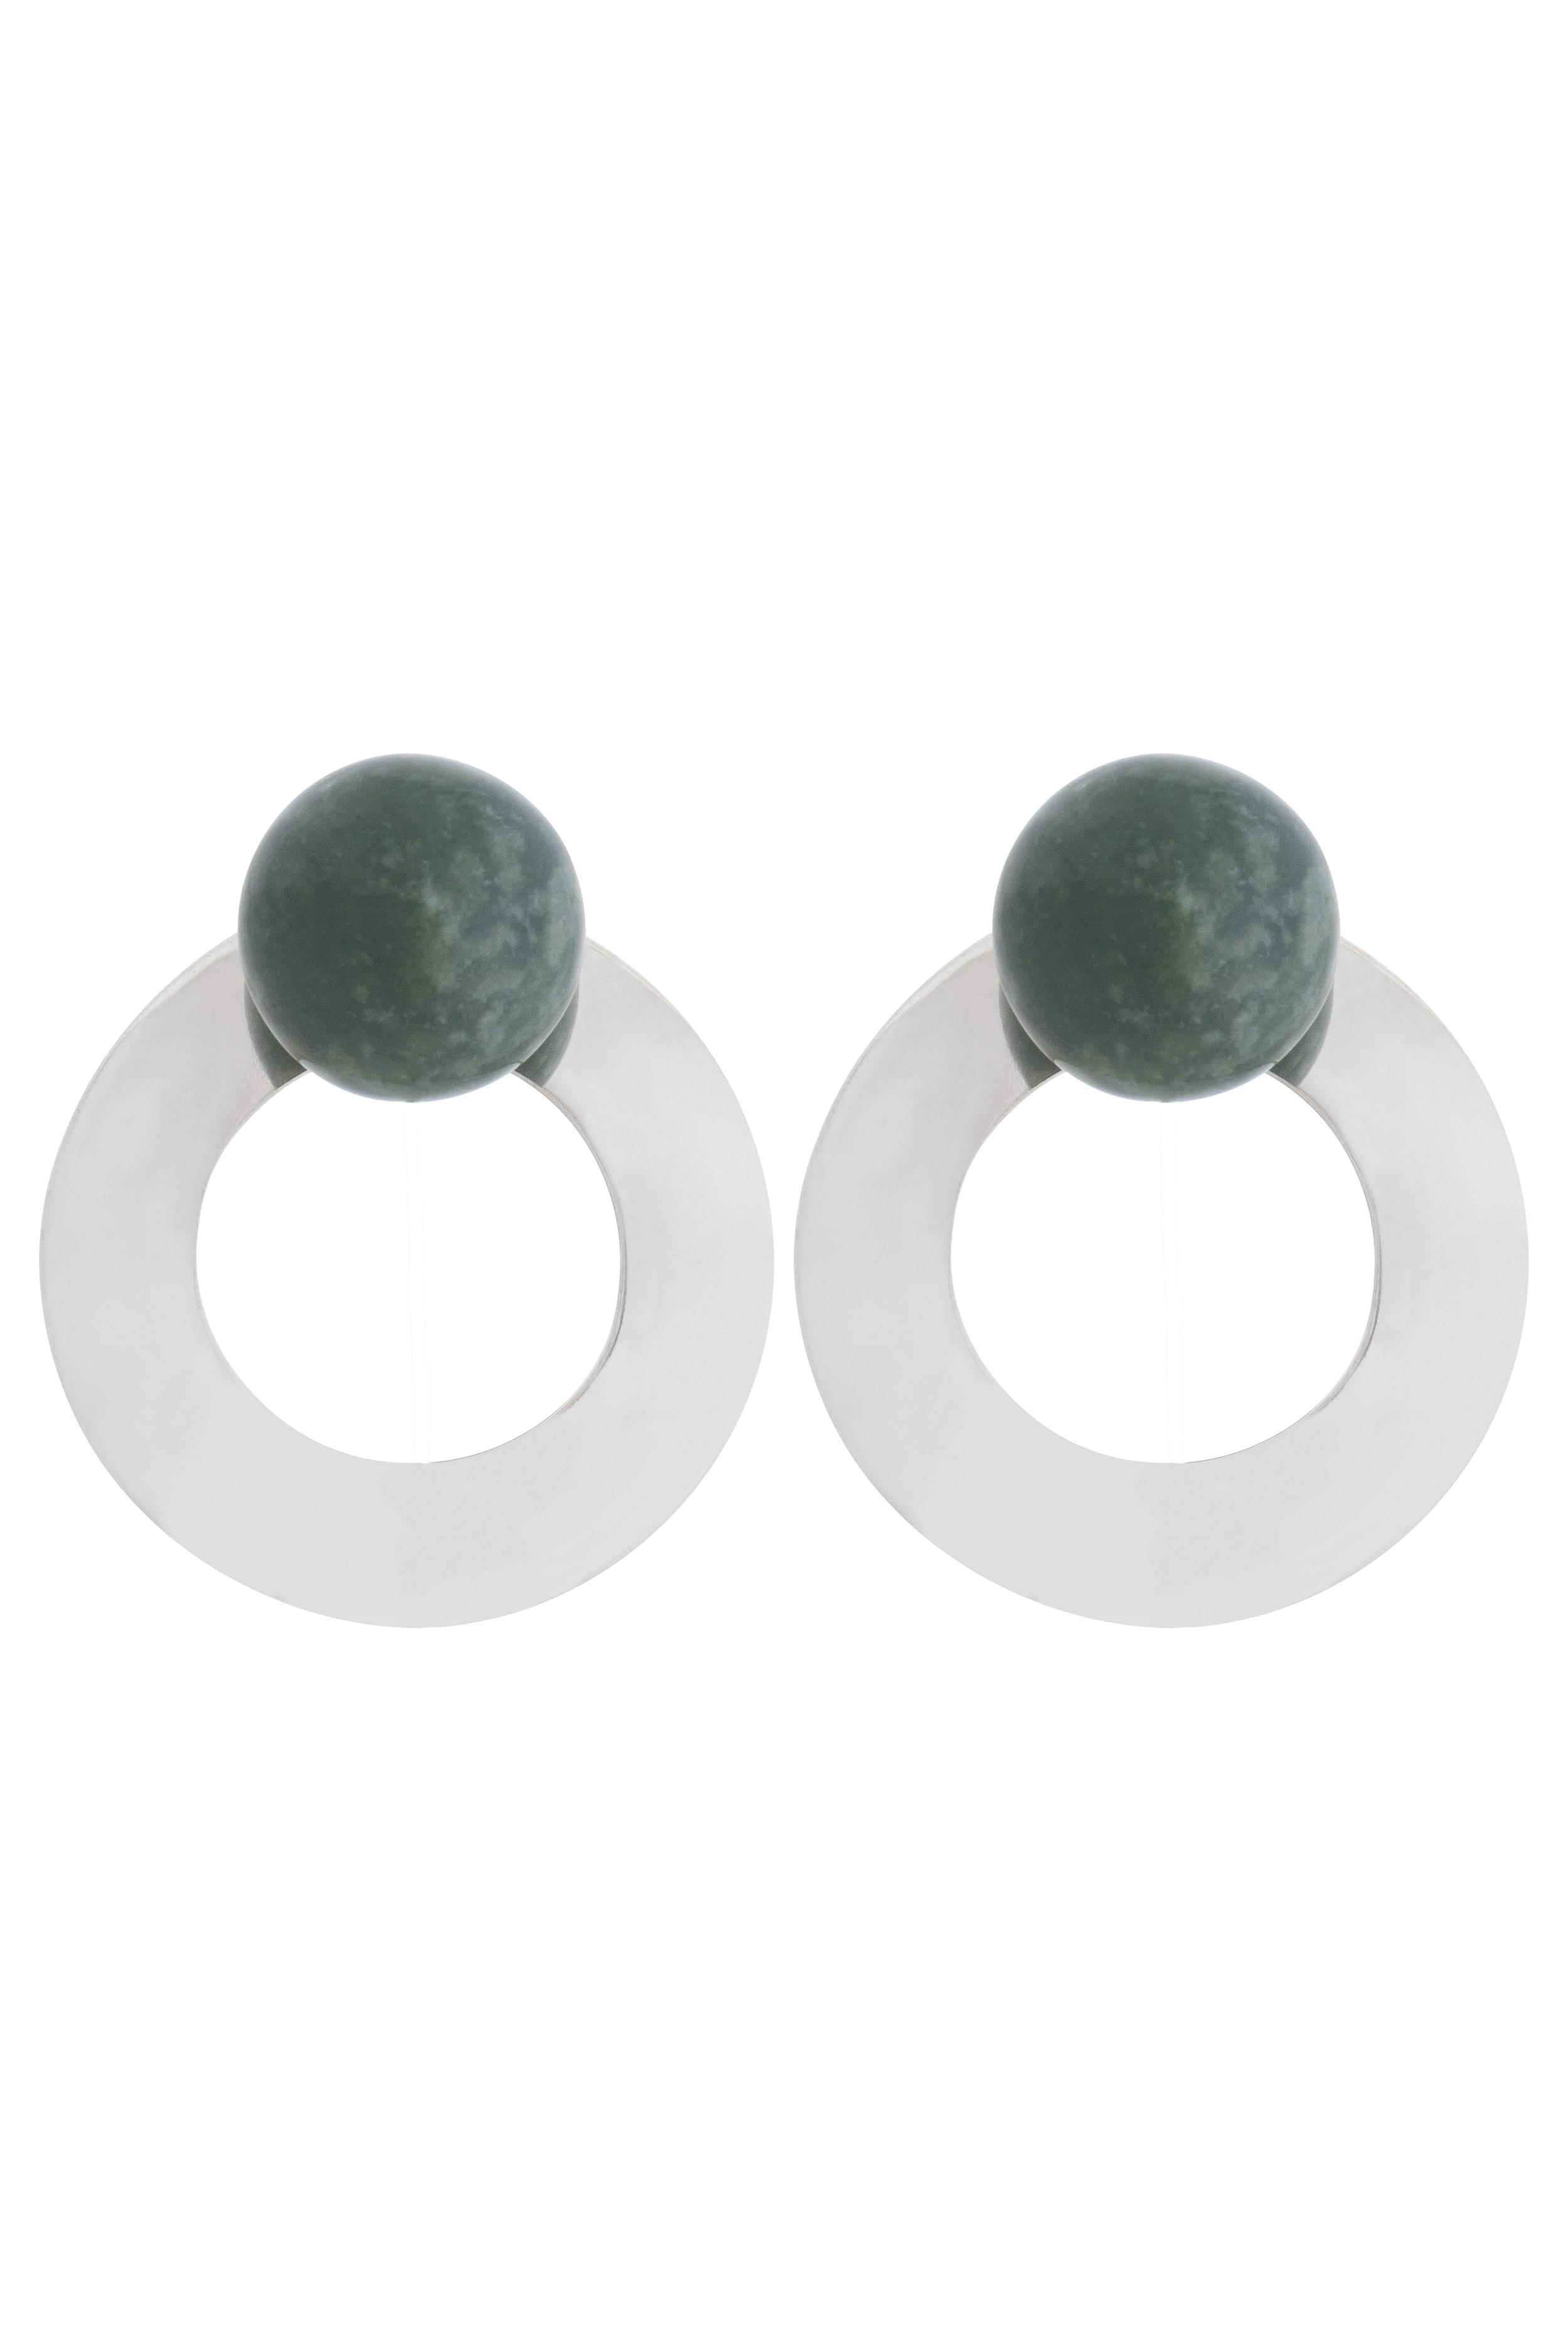 Resonance II Earrings